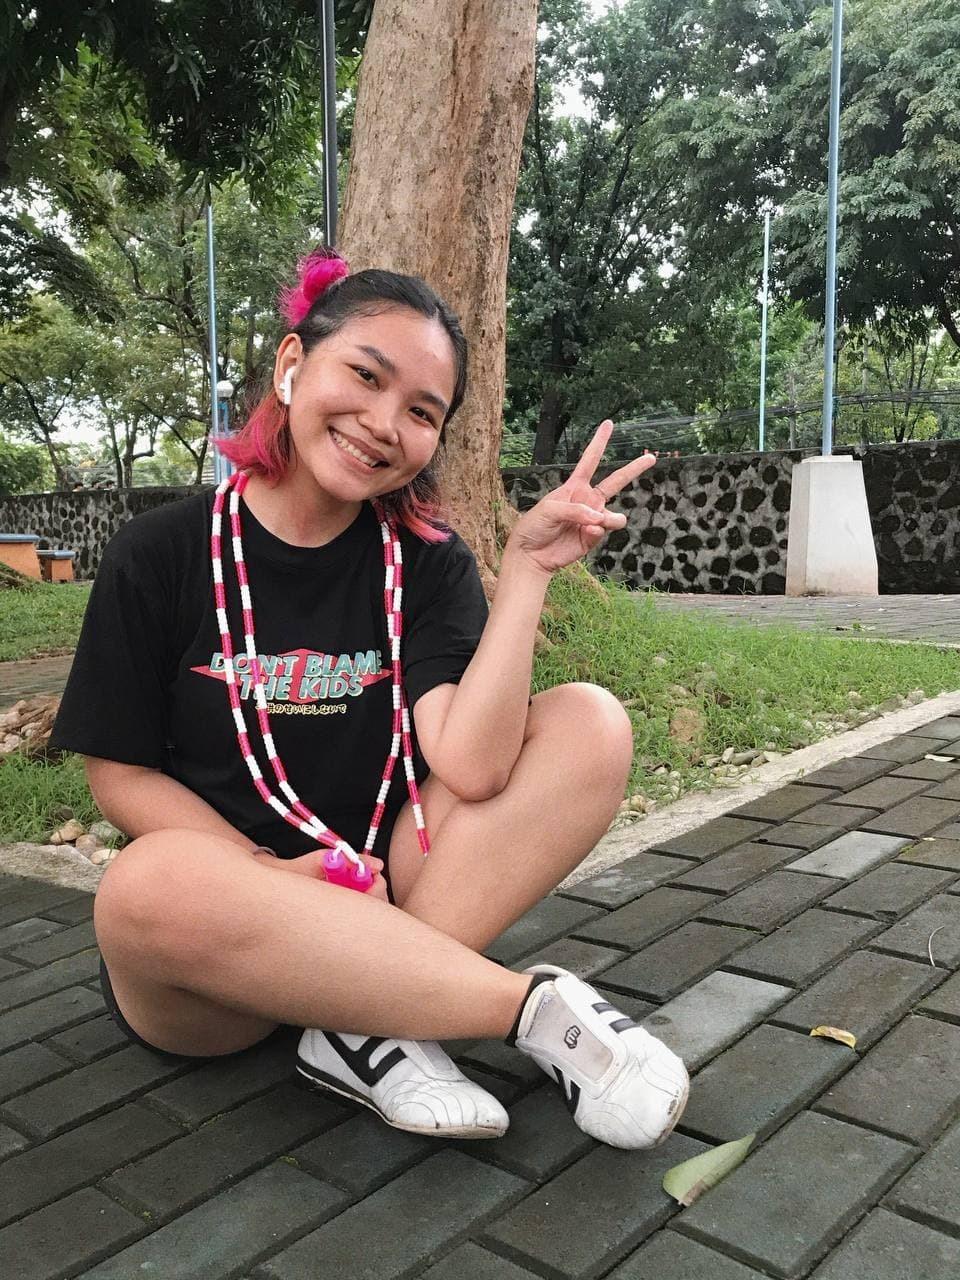 Pinay with jump rope